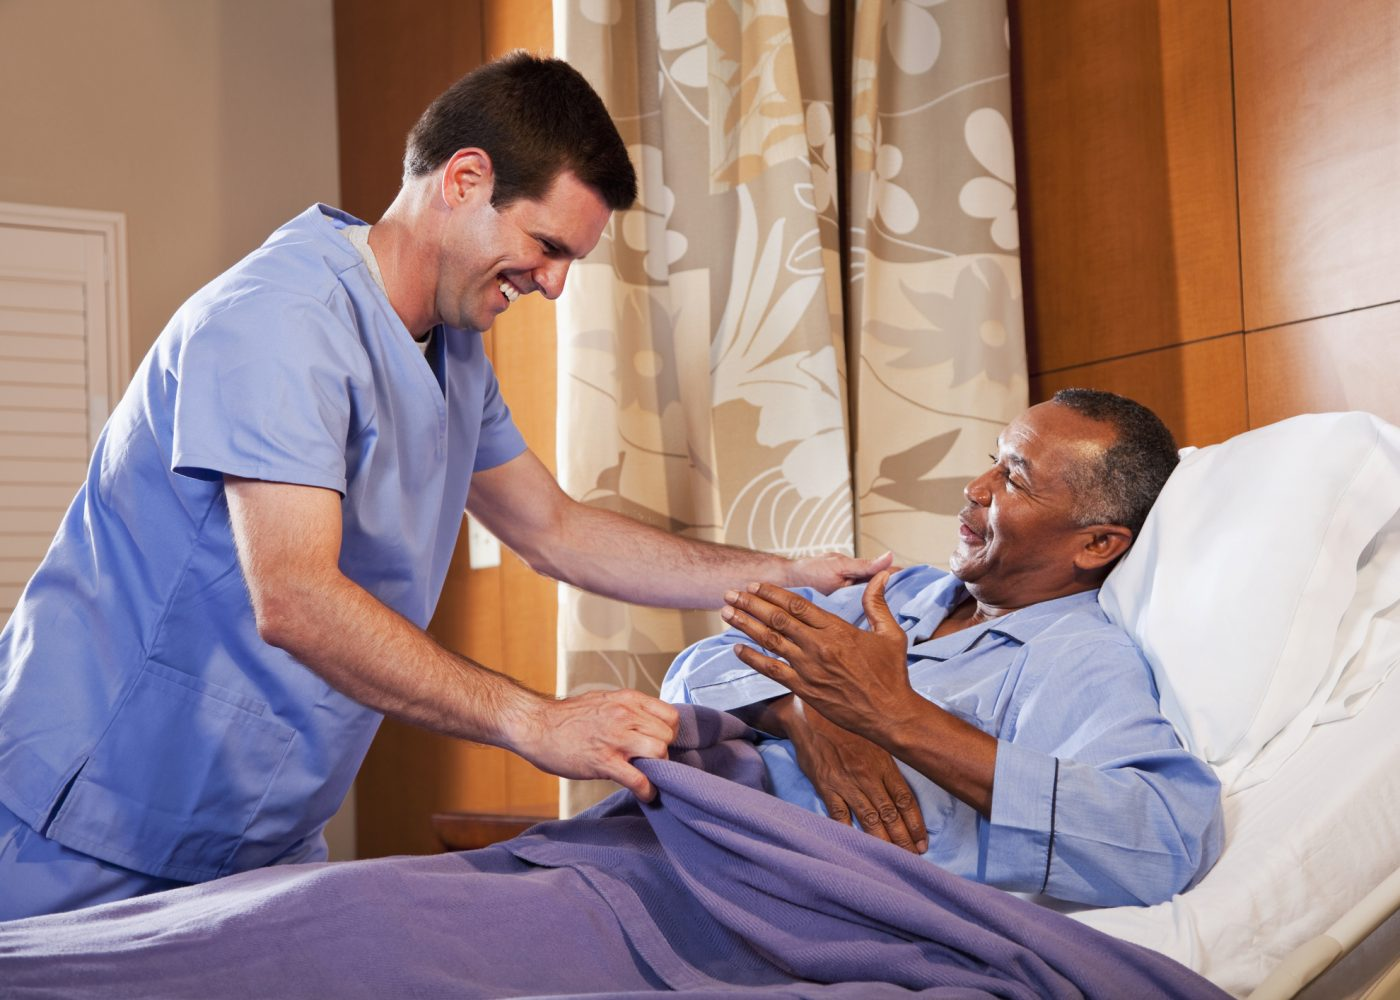 enfermeiro cuidar paciente